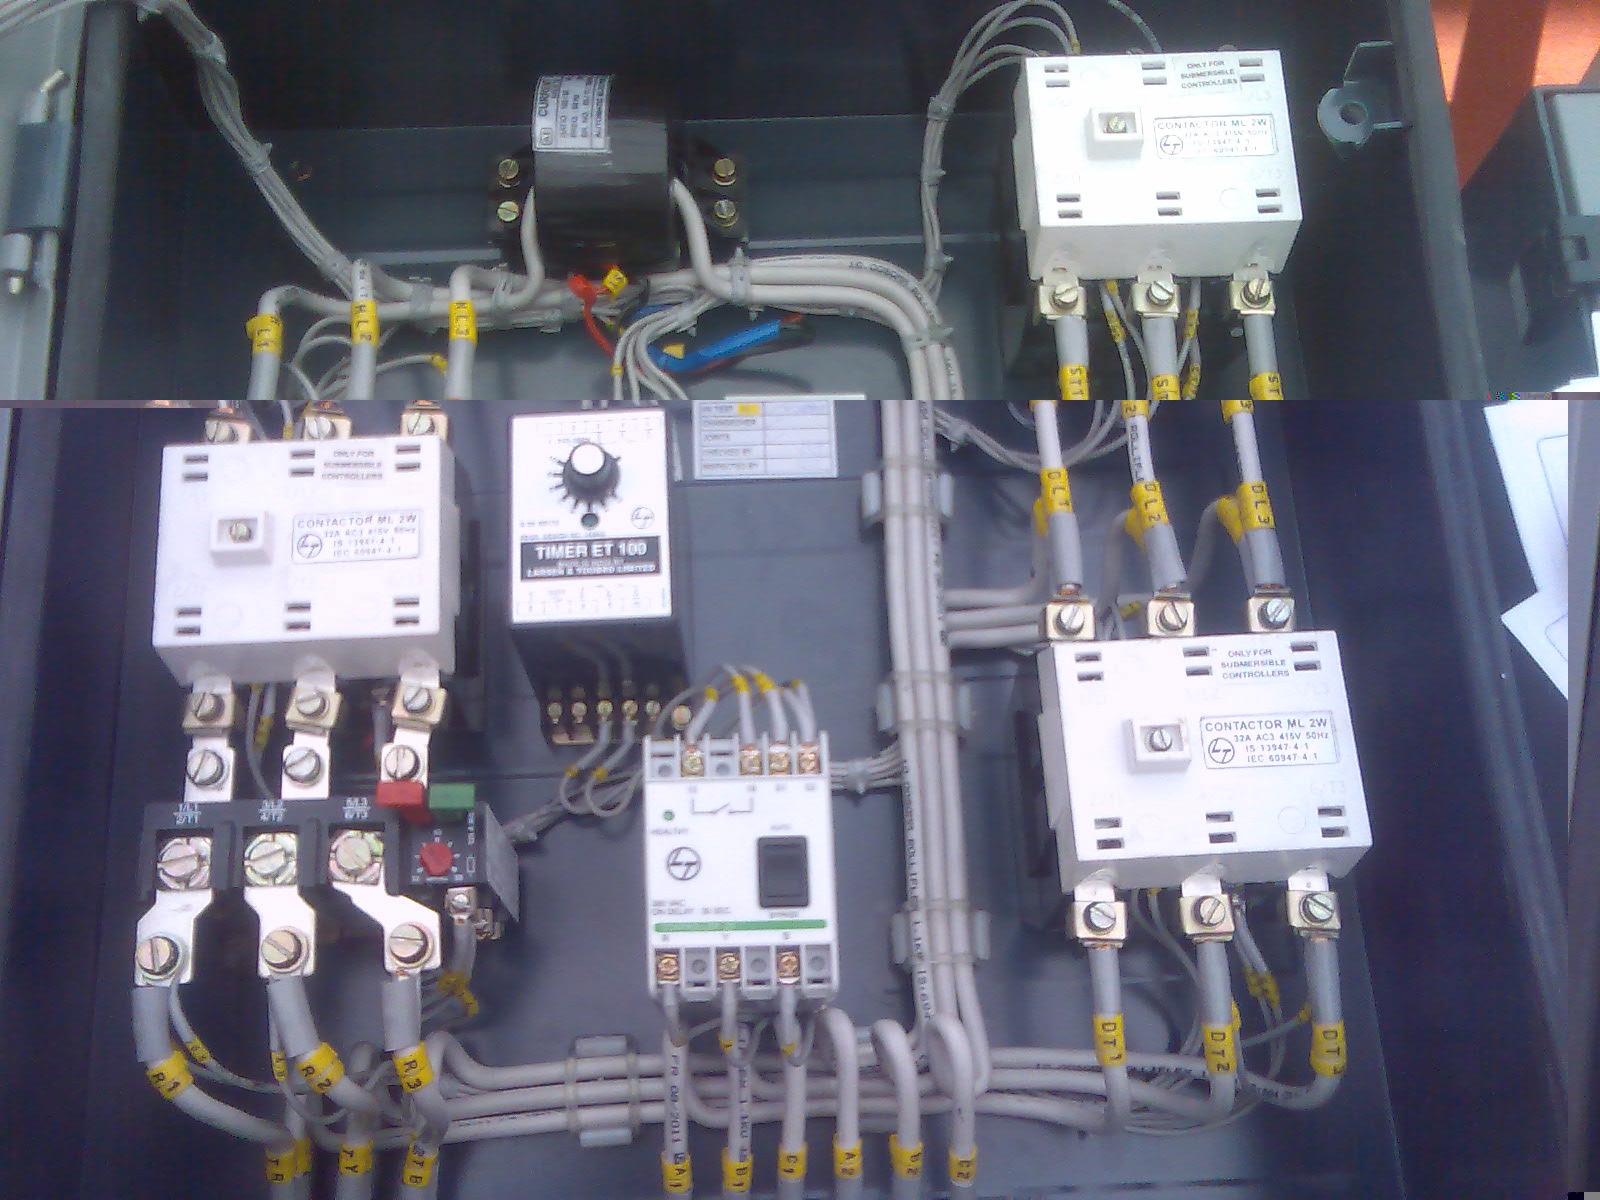 Wye Delta Motor Wiring Jointer Diagram Star Starter Download 1600x1200